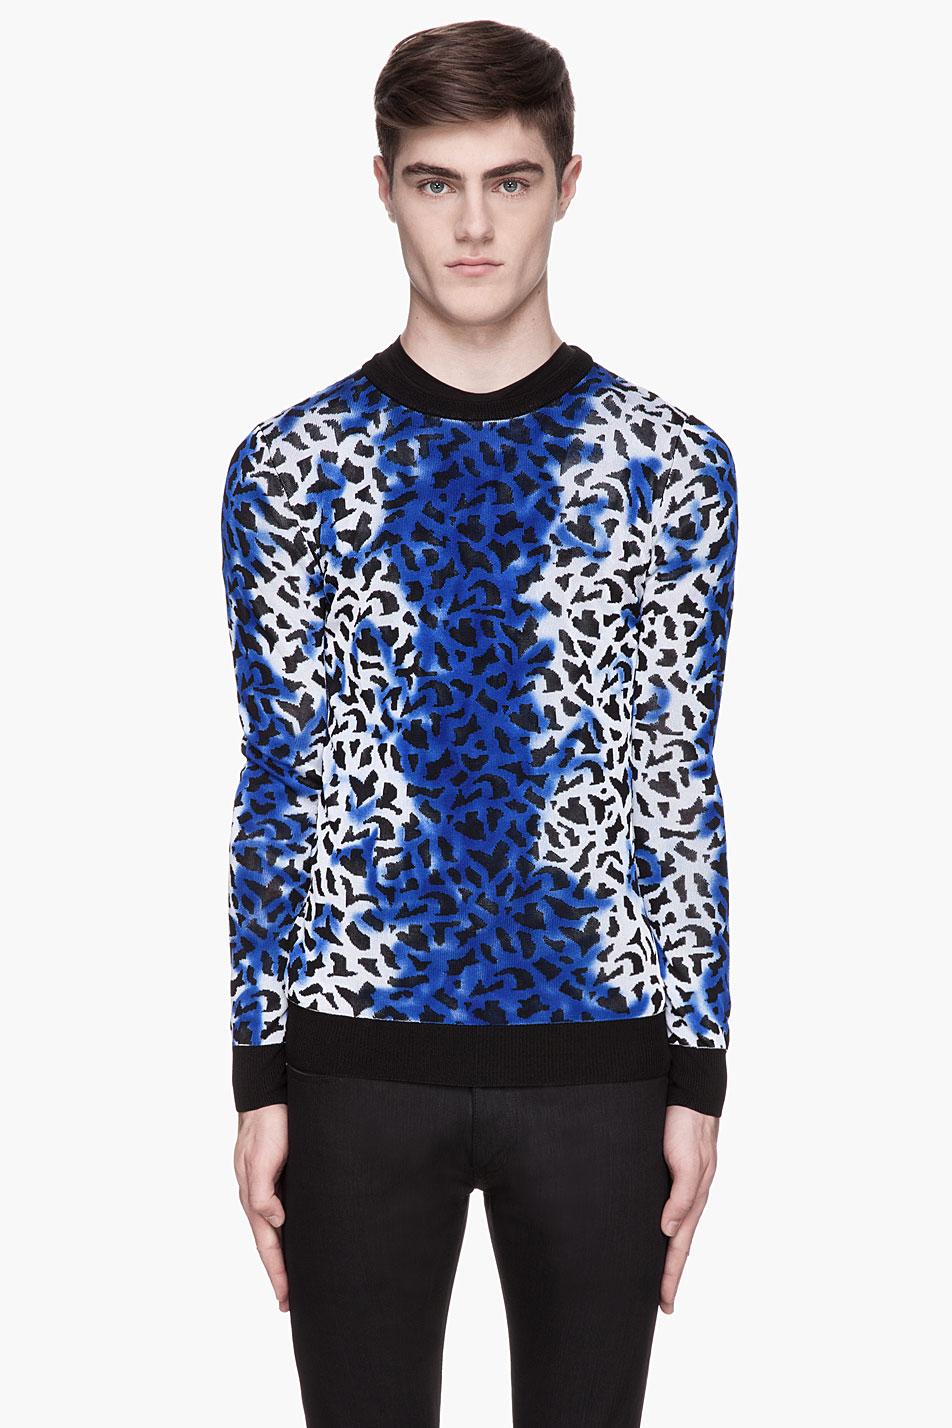 Versus Mottled Blue Leopard Print Sweater in Blue for Men | Lyst